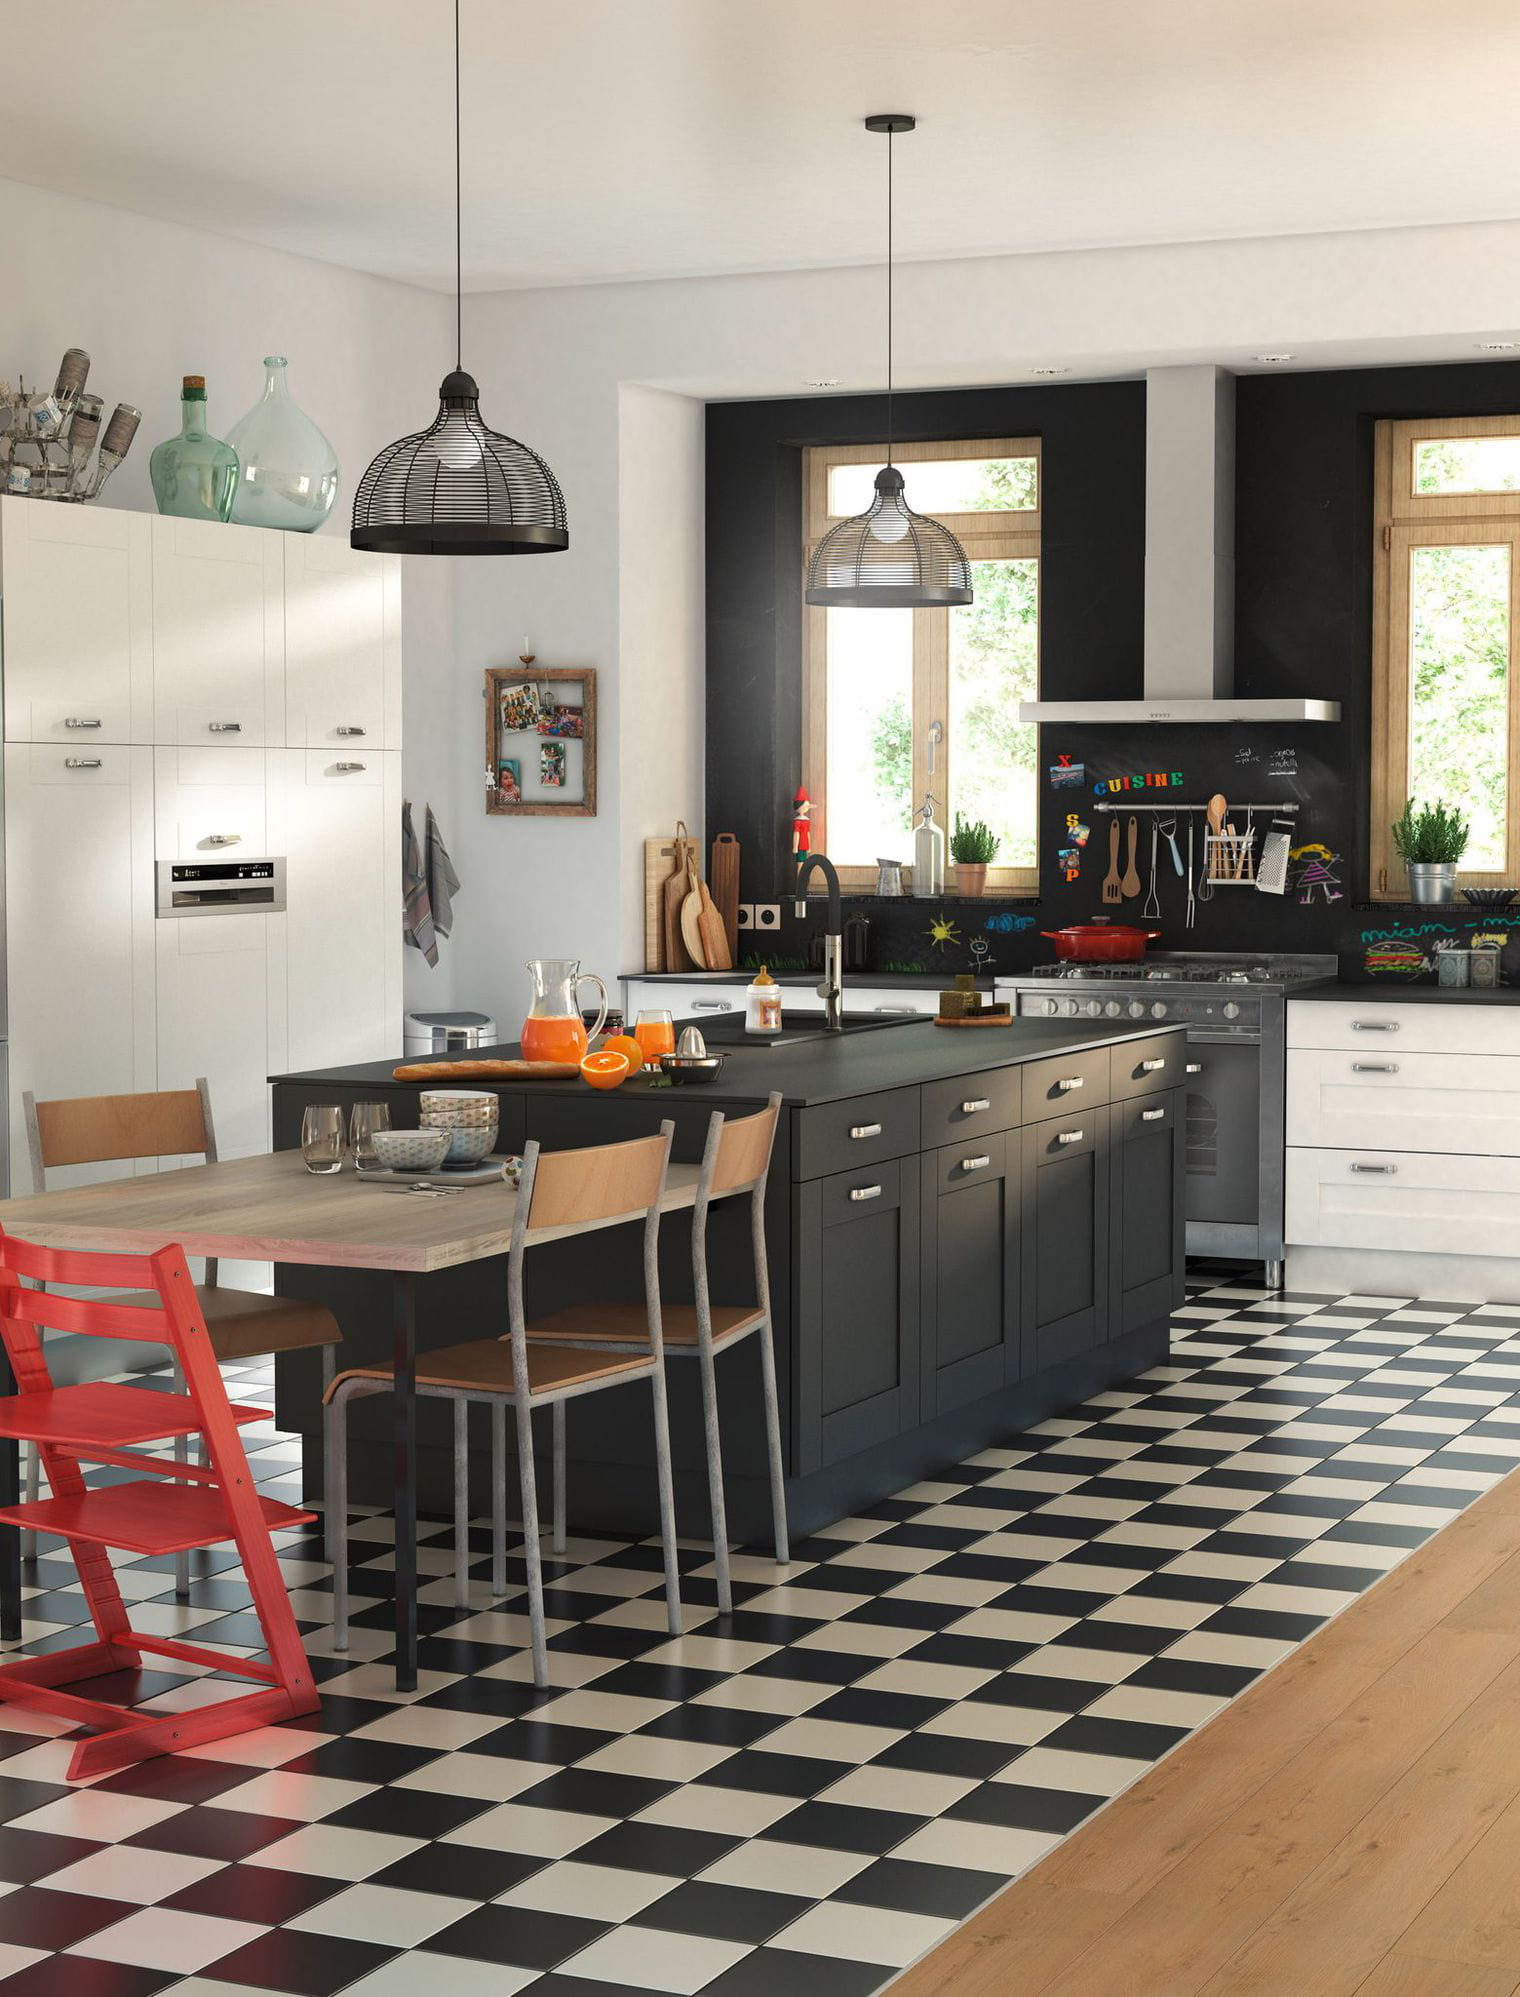 Les erreurs viter avec une cuisine ouverte - Modele de cuisine castorama ...